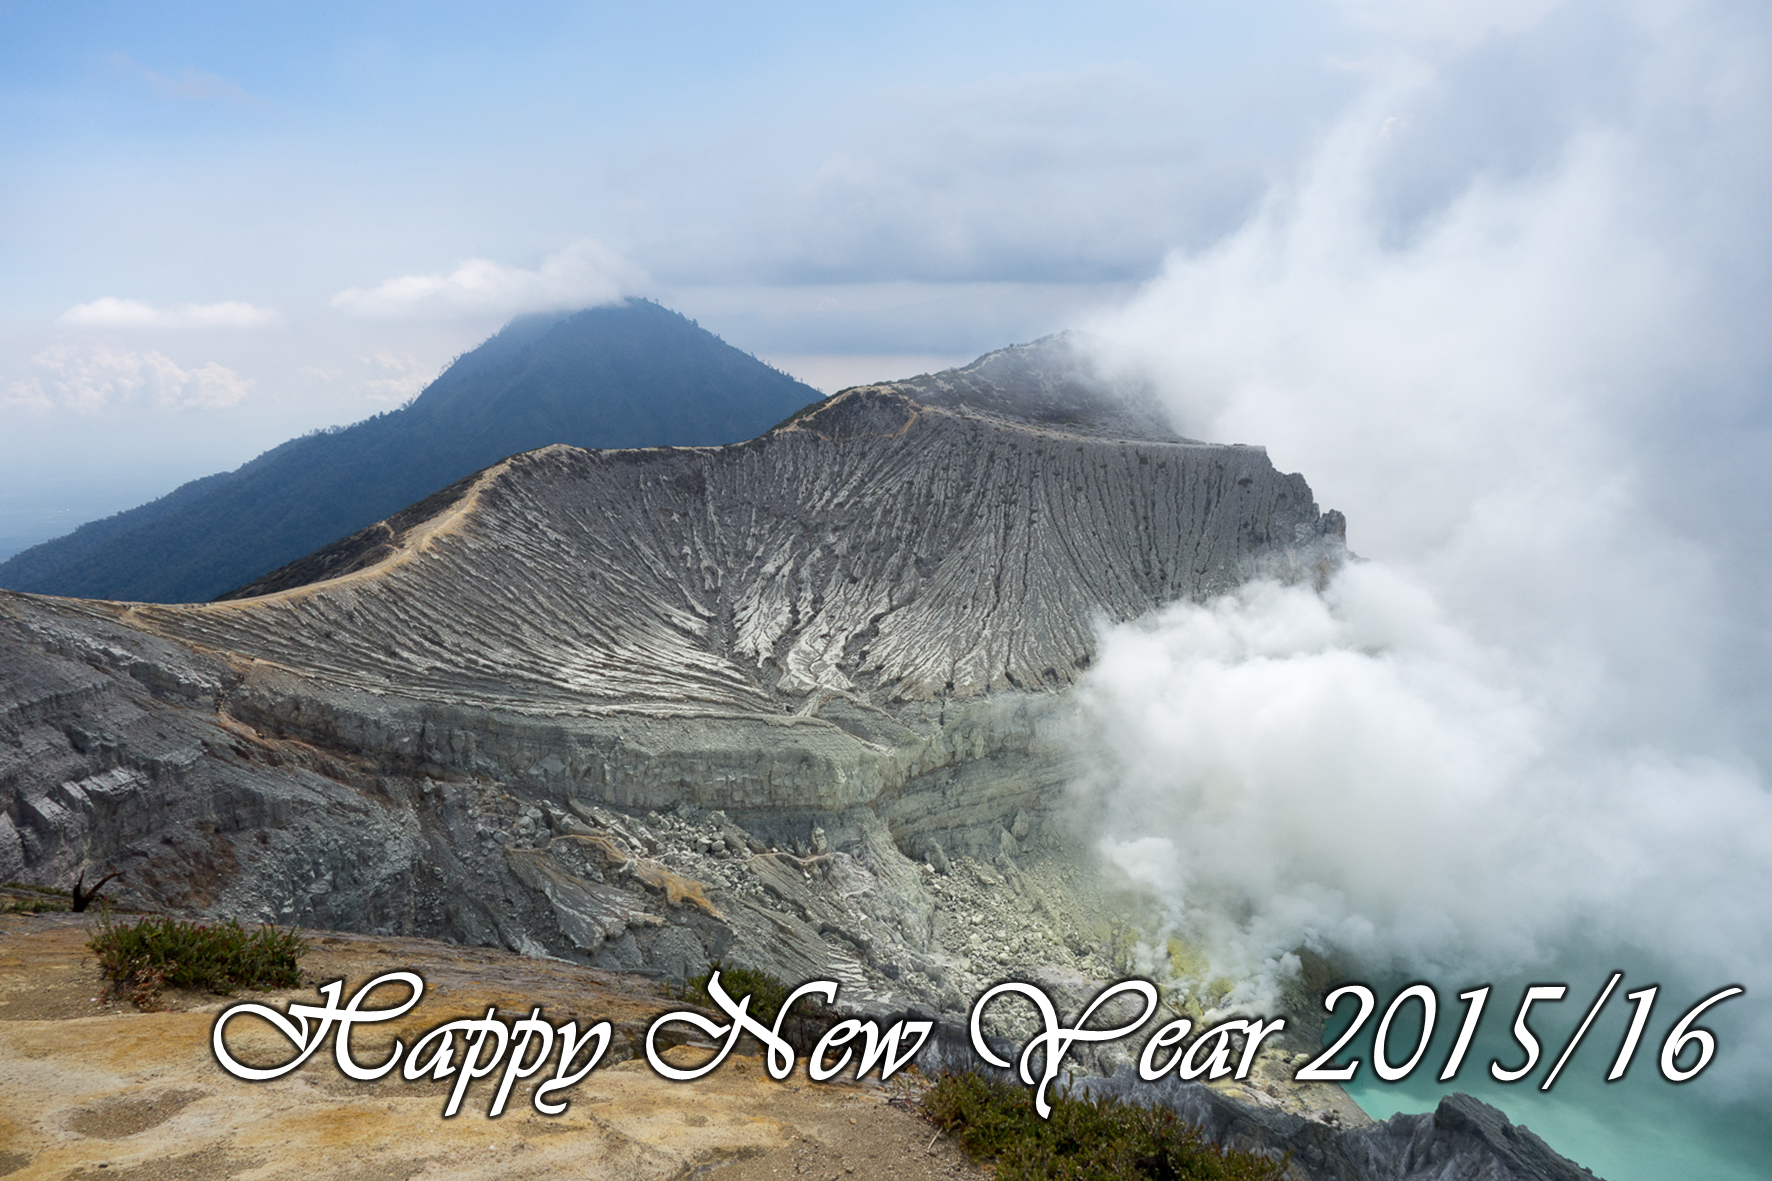 Happy New Year 2015/16